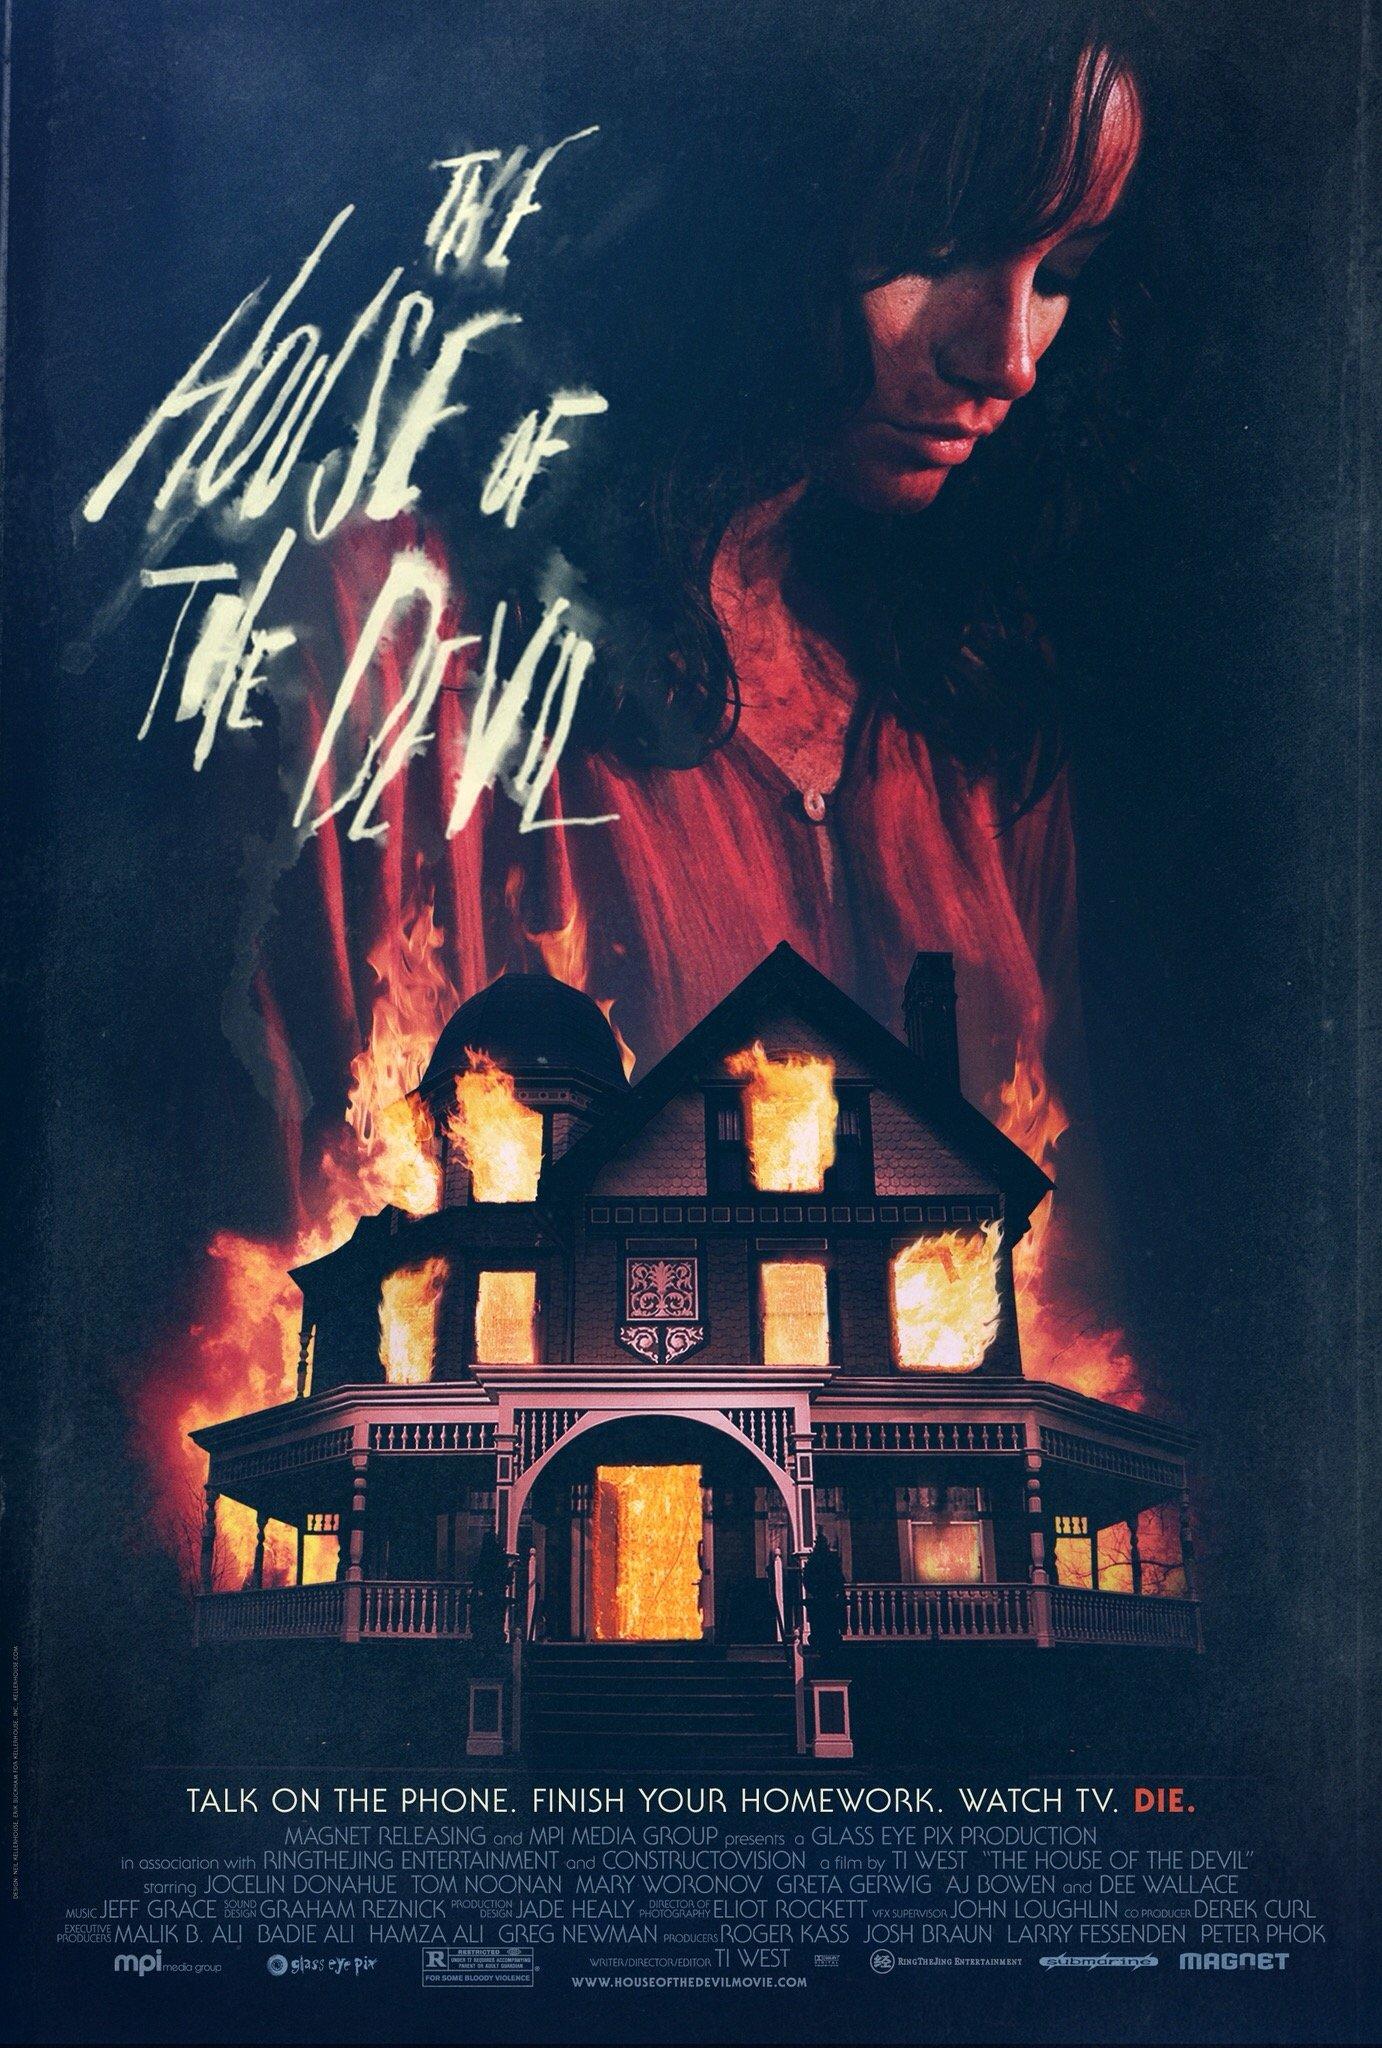 40 Great Horror Films for the Halloween Season Part 1